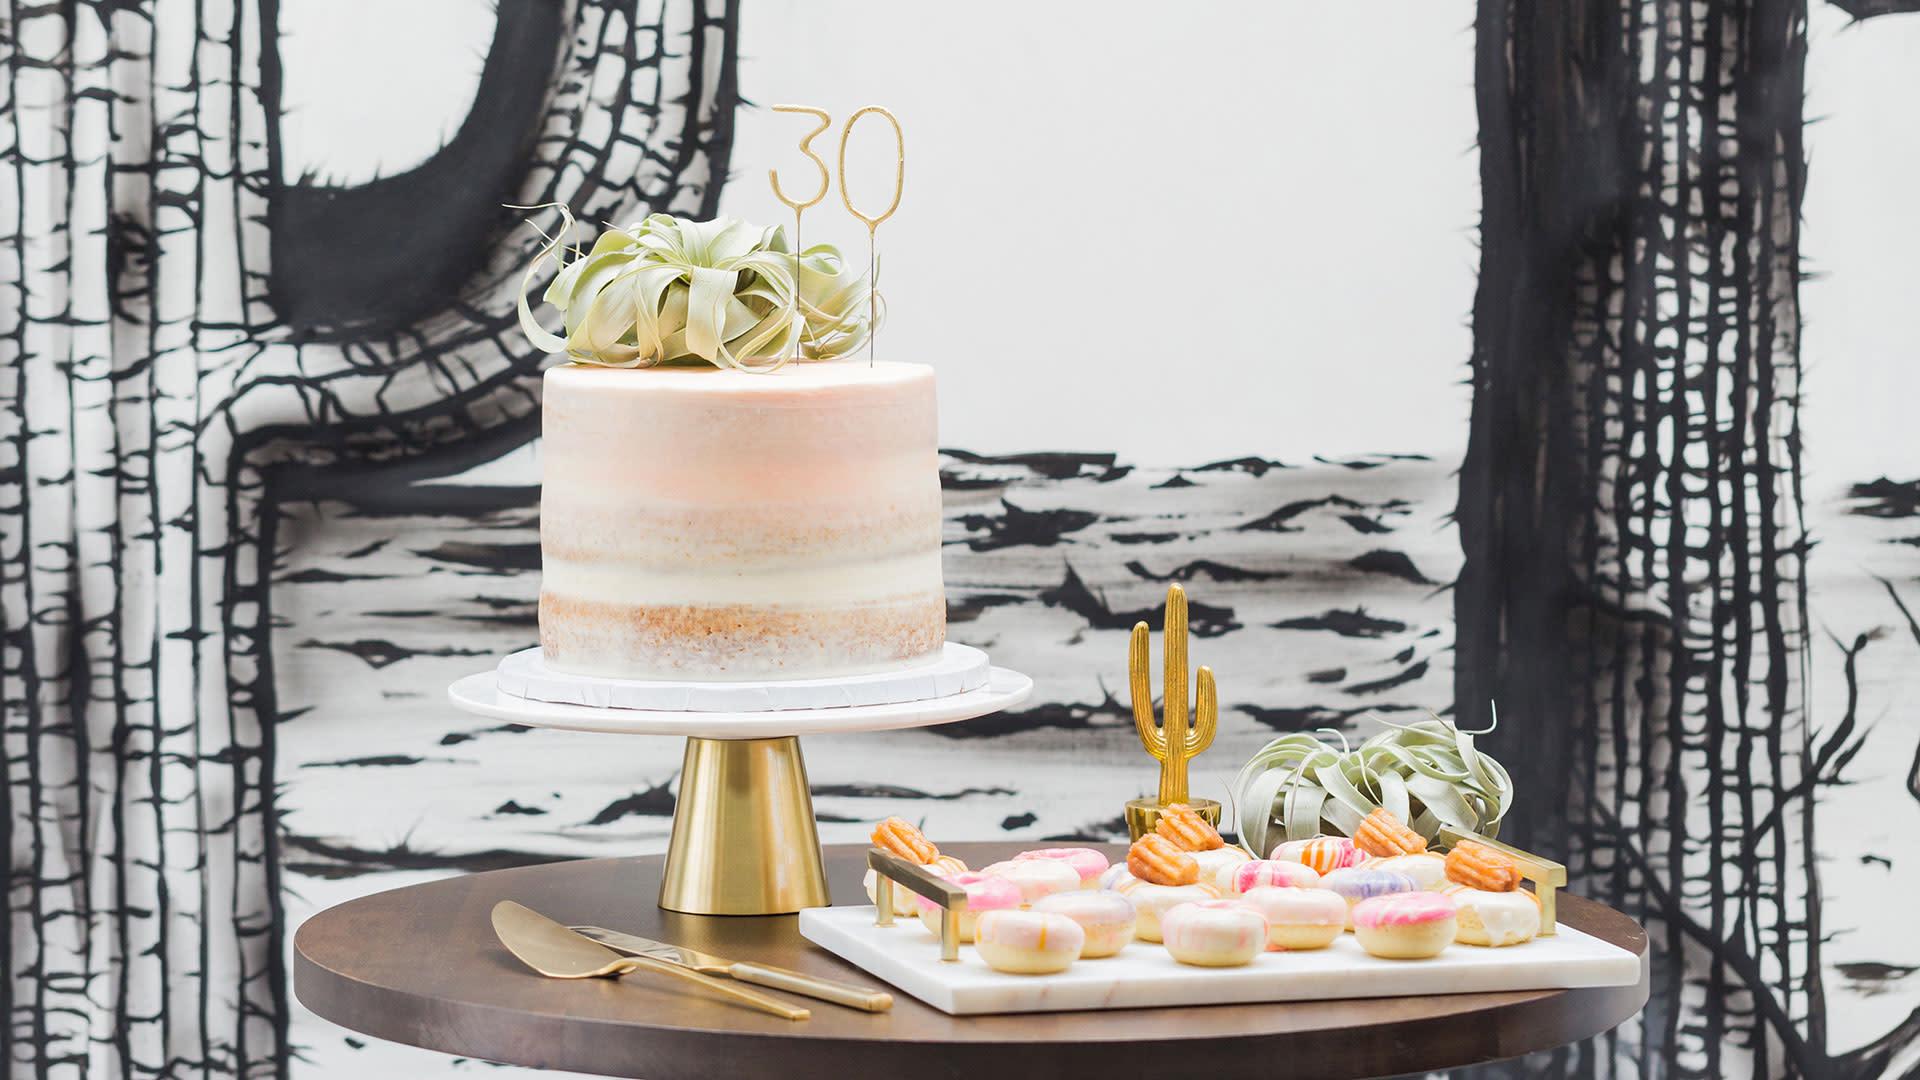 greater palm springs birthday cake